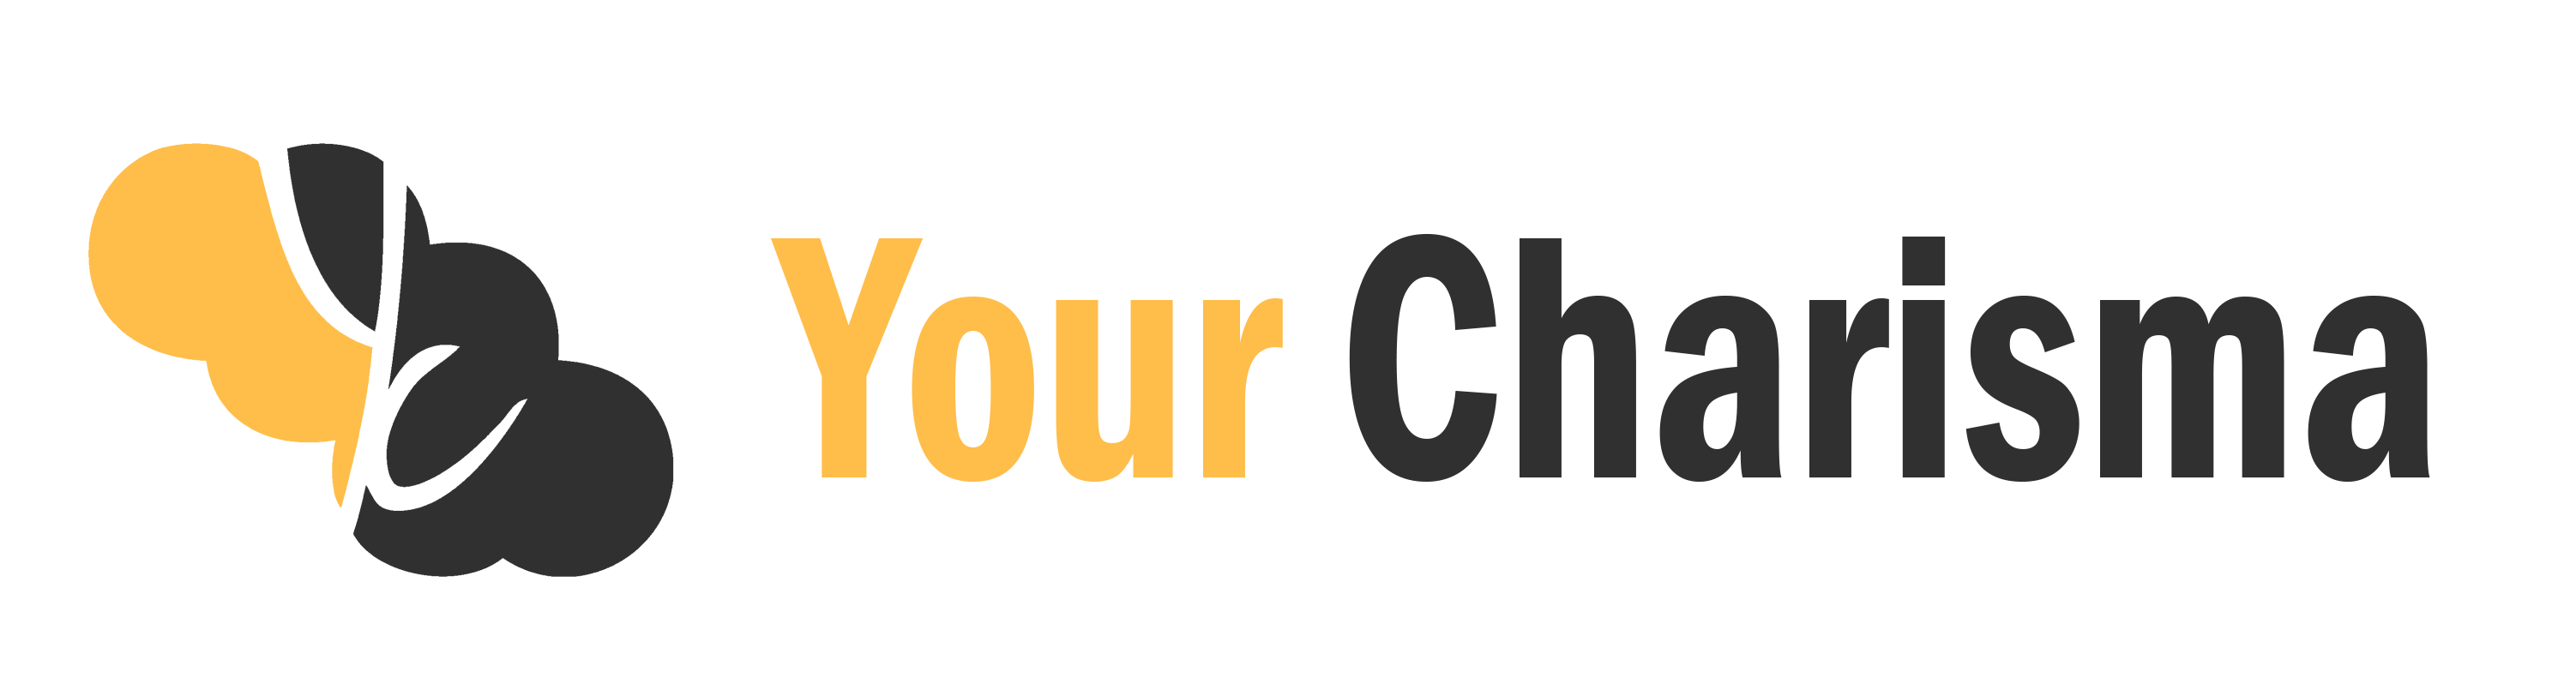 Your Charisma B.V. | Social Media Consultancy